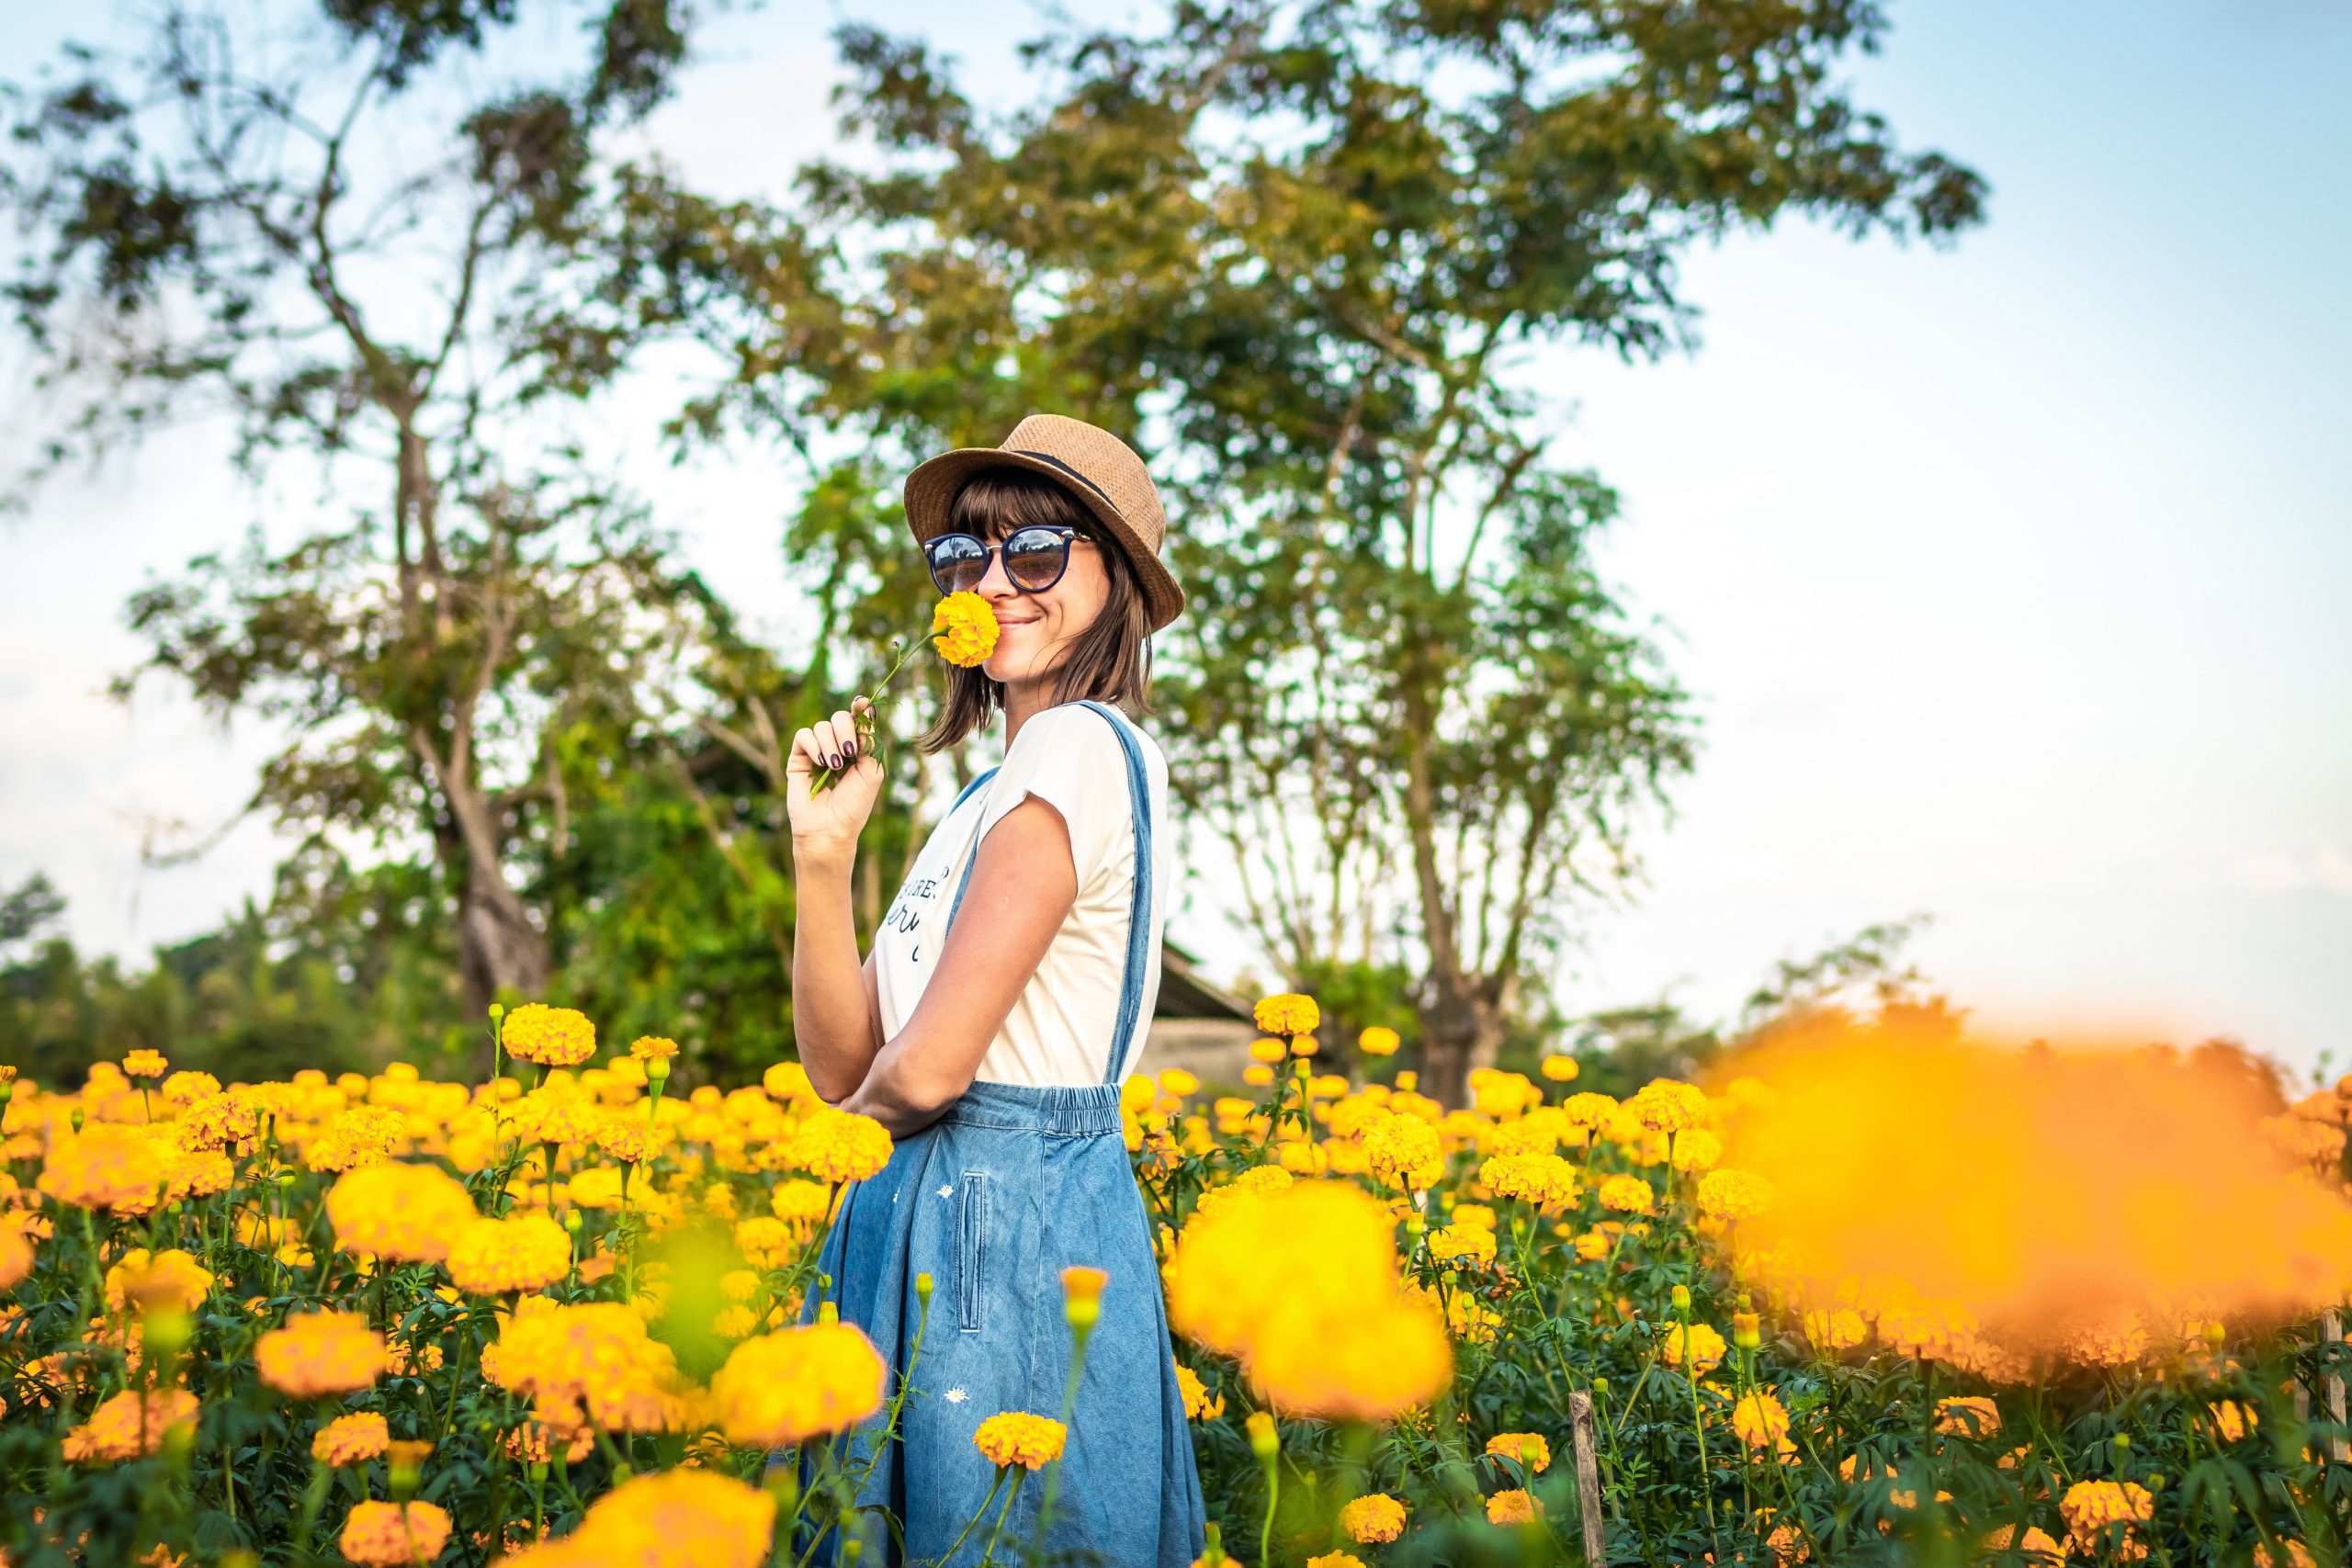 Woman smiling in field of flowers